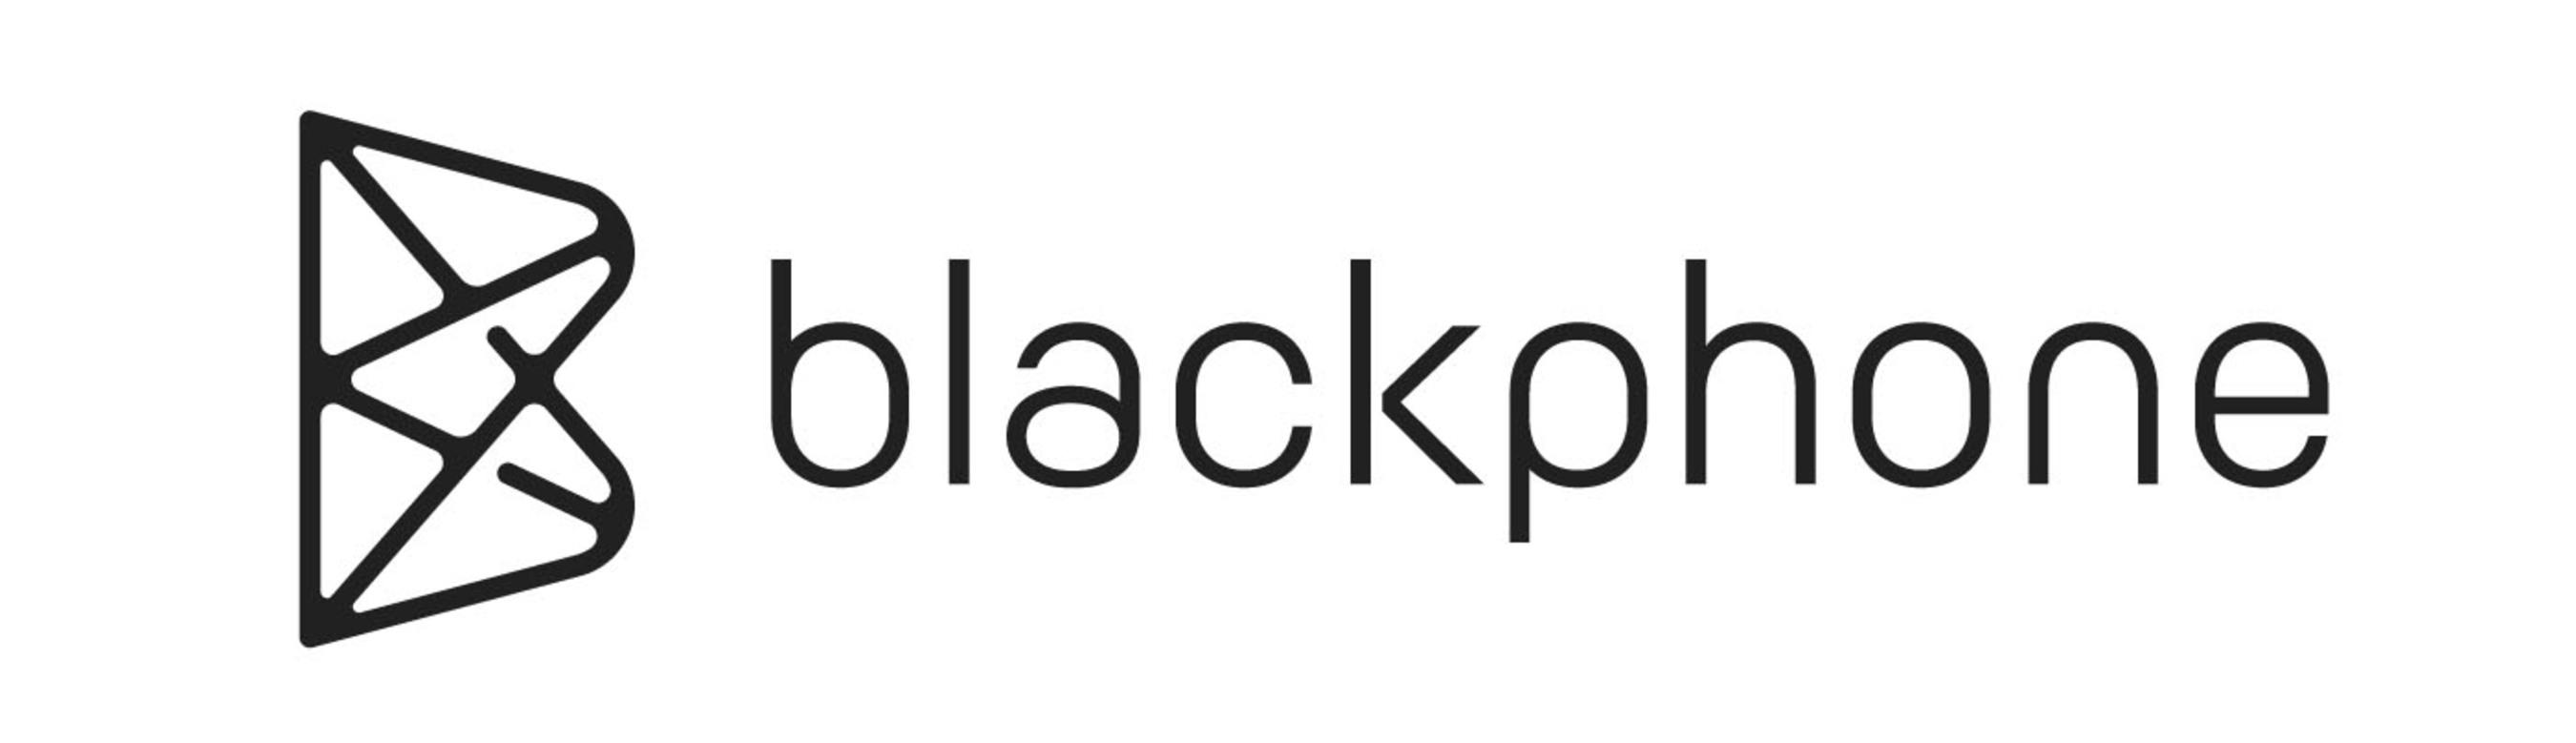 blackphone.ch